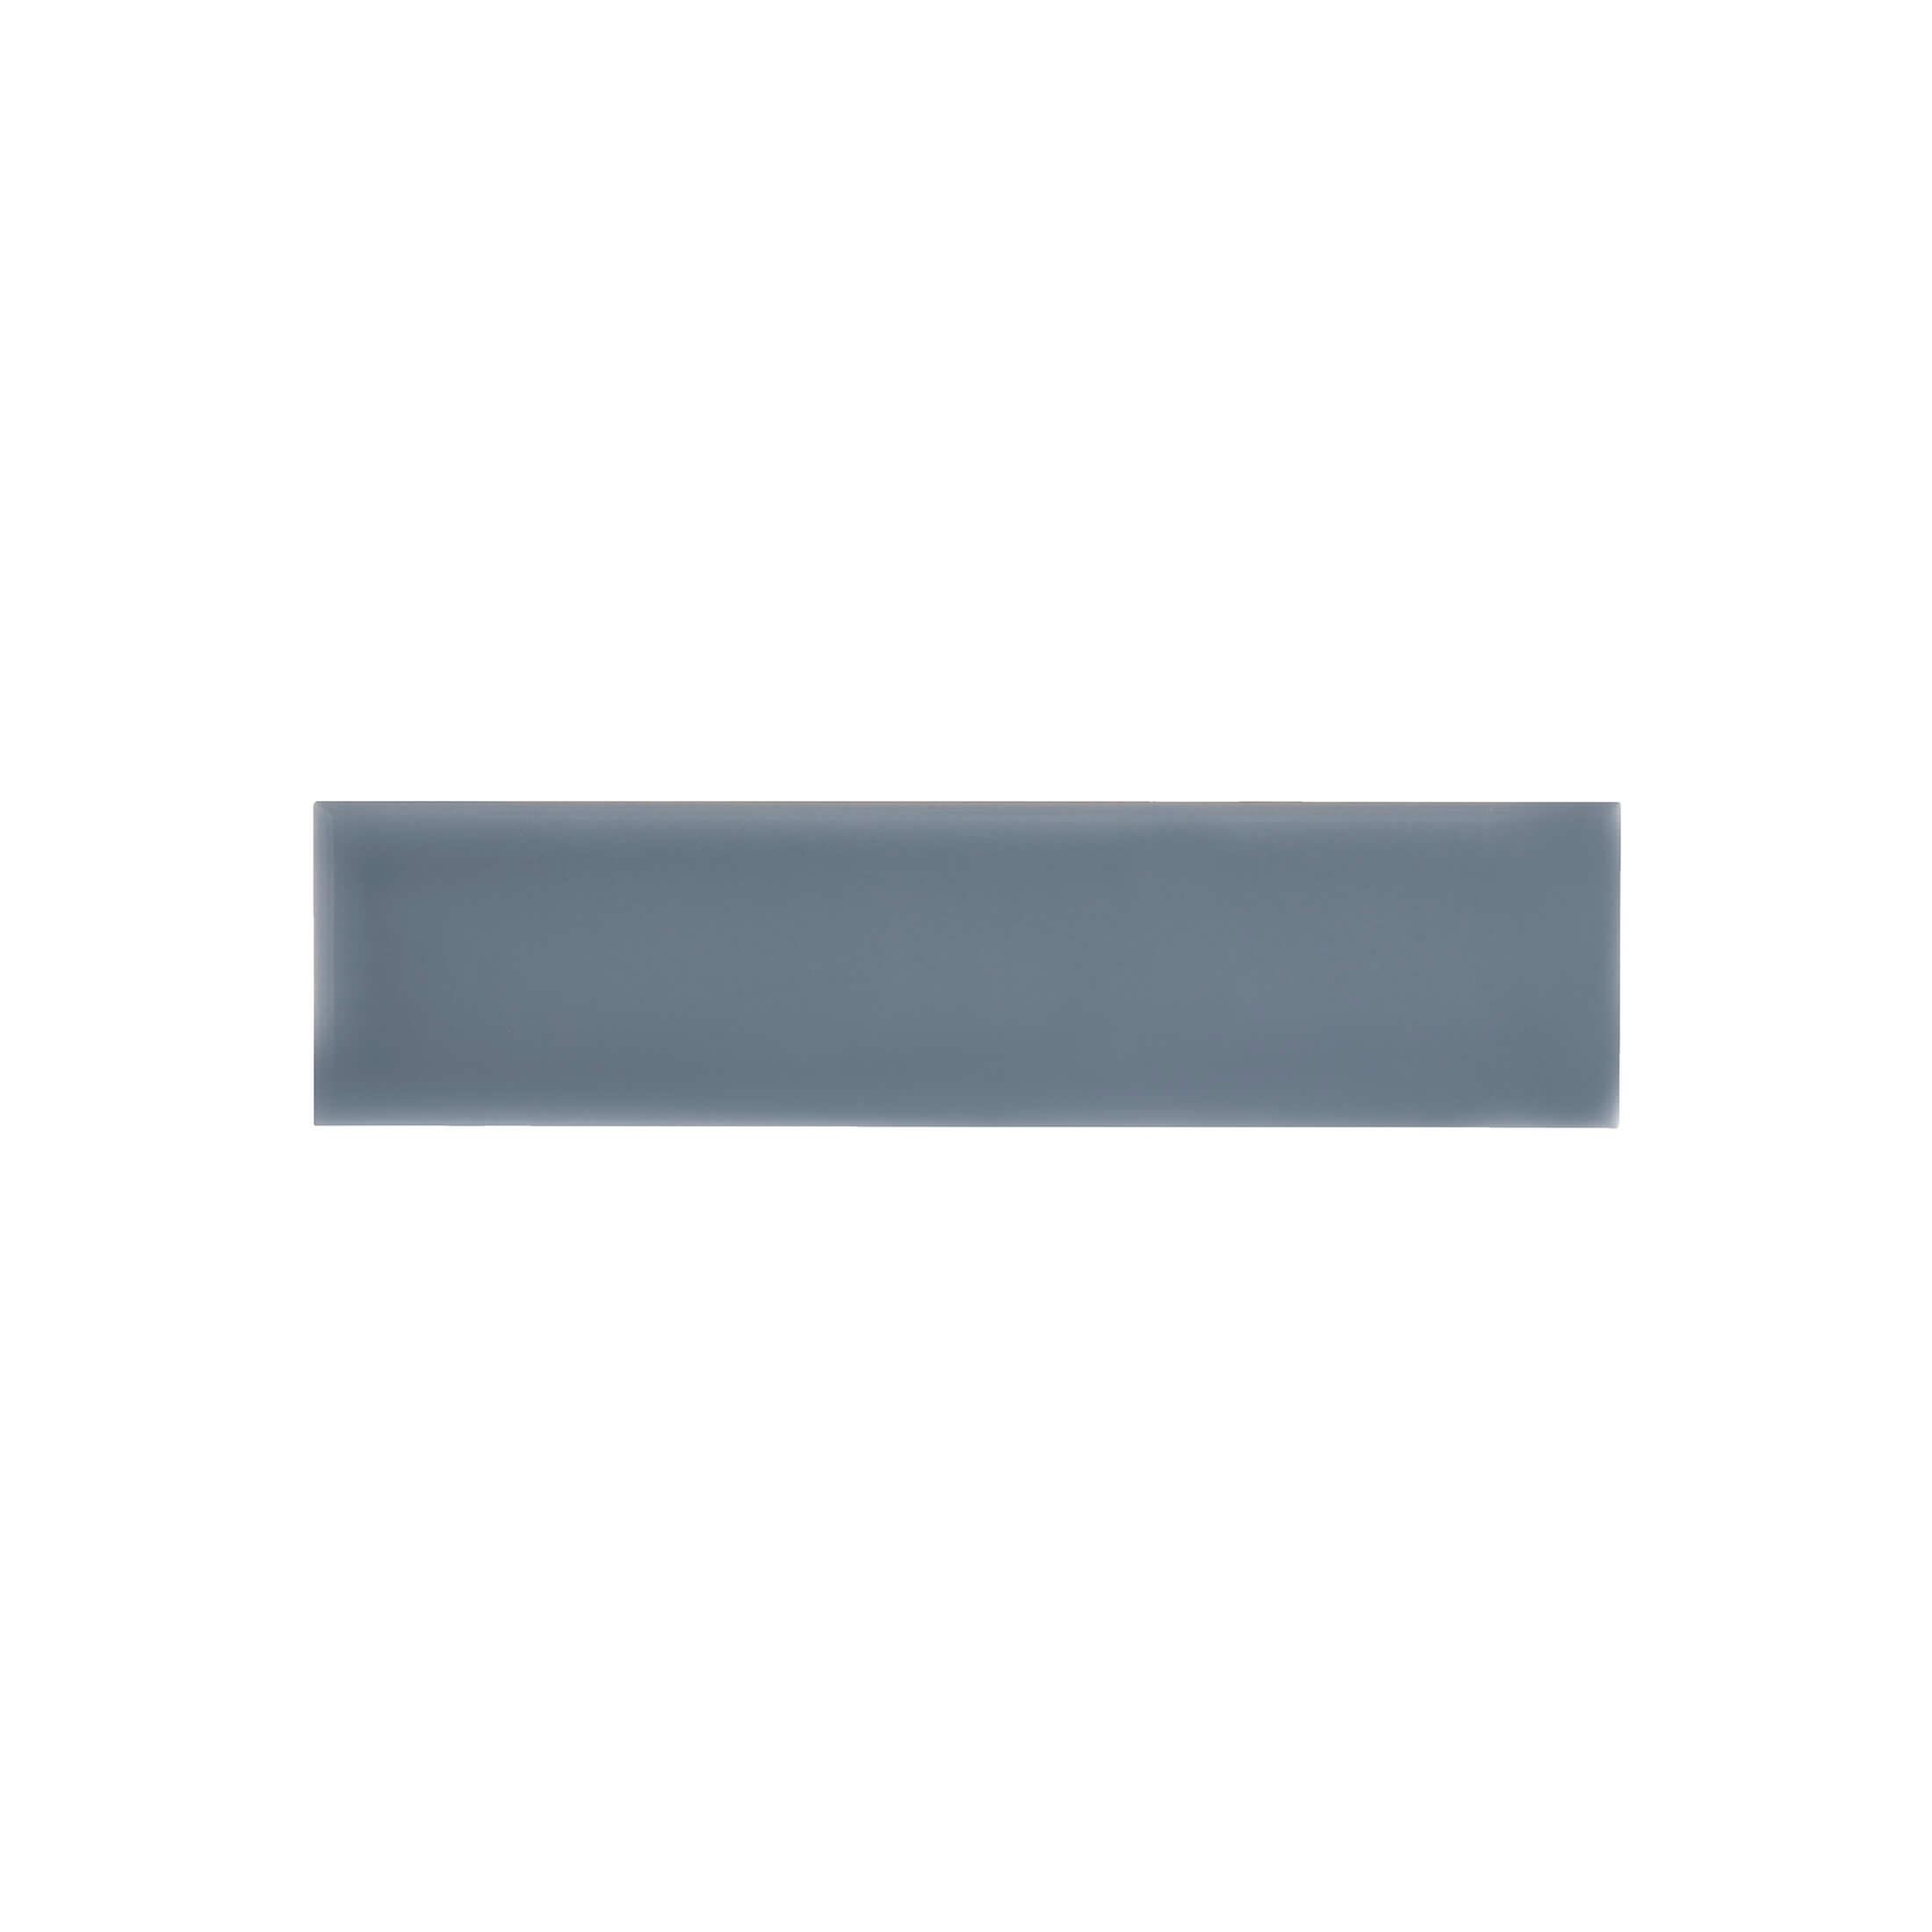 ADNE1099 - LISO PB - 5 cm X 20 cm